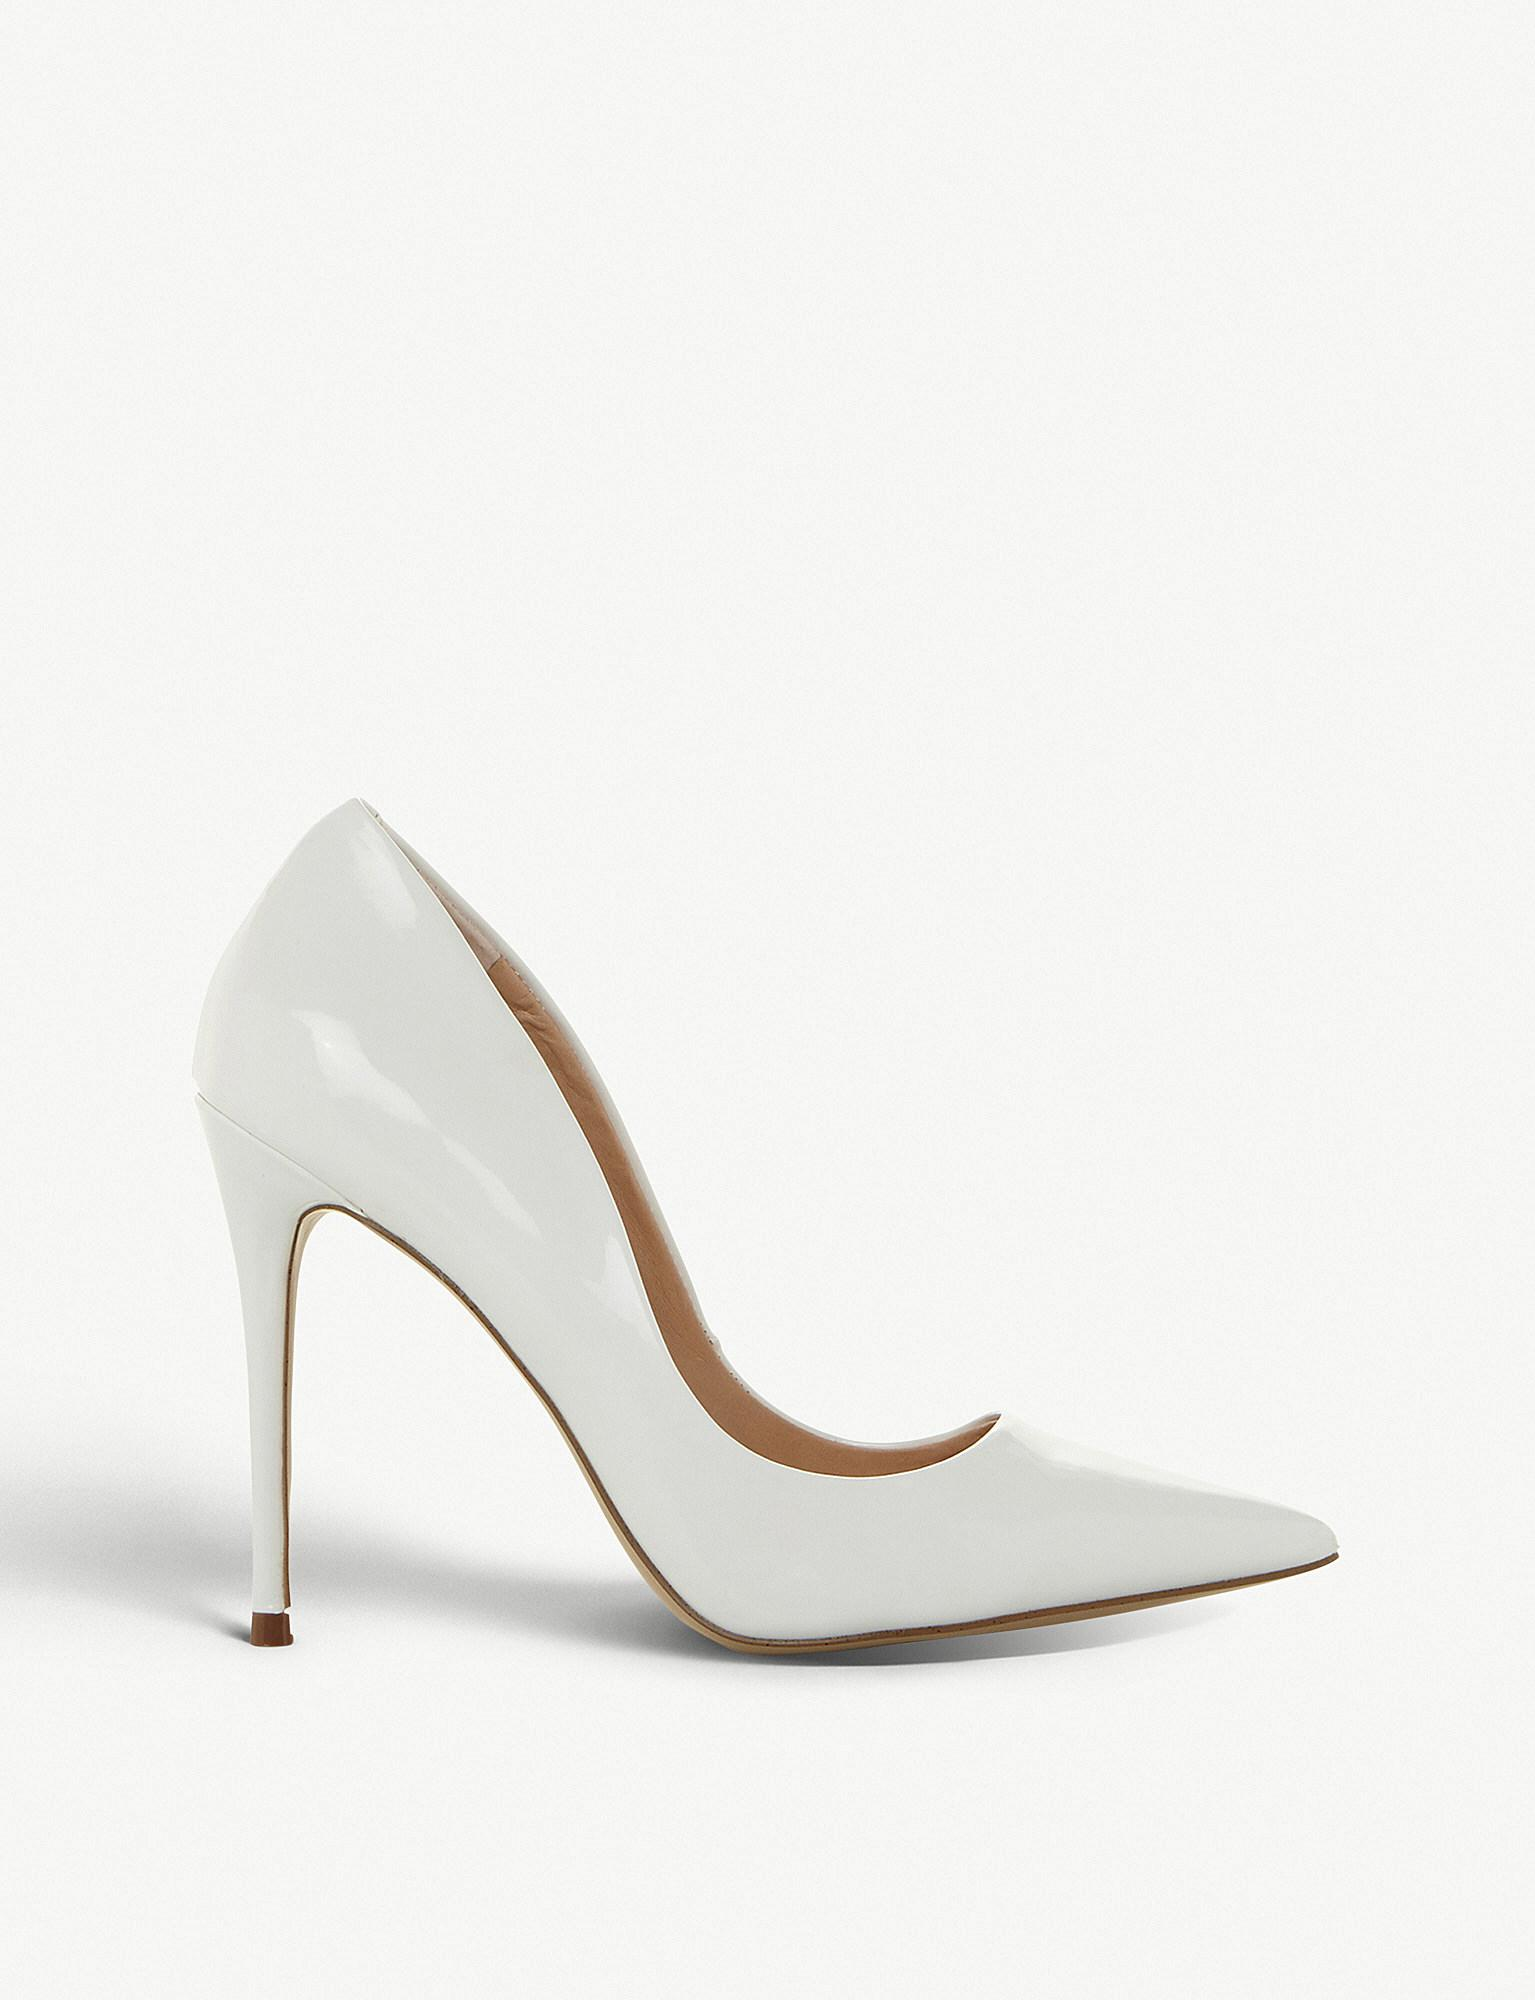 92f961adab1 Lyst - Steve Madden Daisie Pointed Toe Stiletto Heel Courts in White